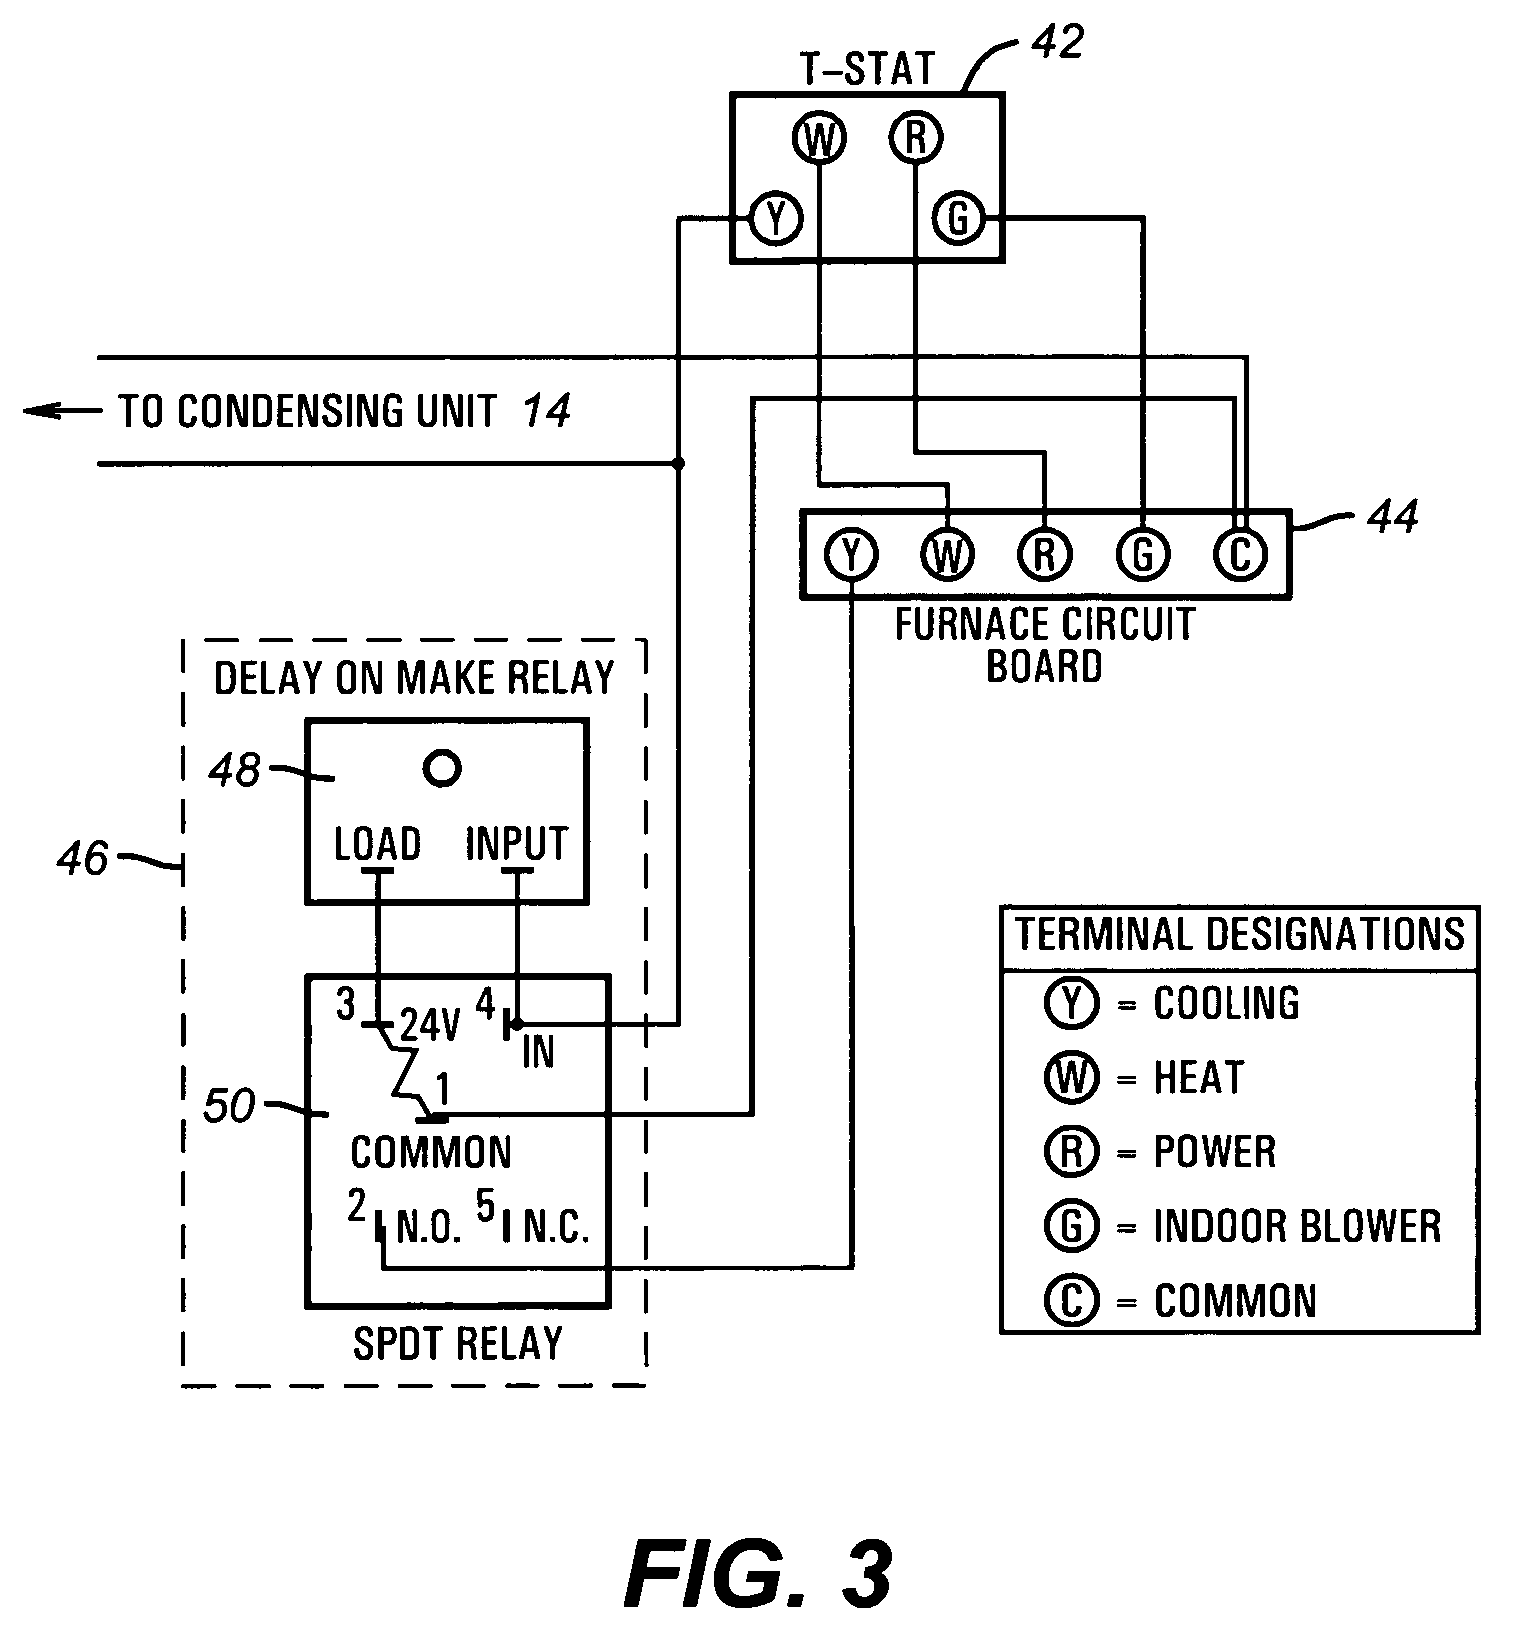 Ranco Humidistat Wiring Diagram Good 1st A Data Schema Rh 37 Danielmeidl De Honeywell Wire To Thermostat